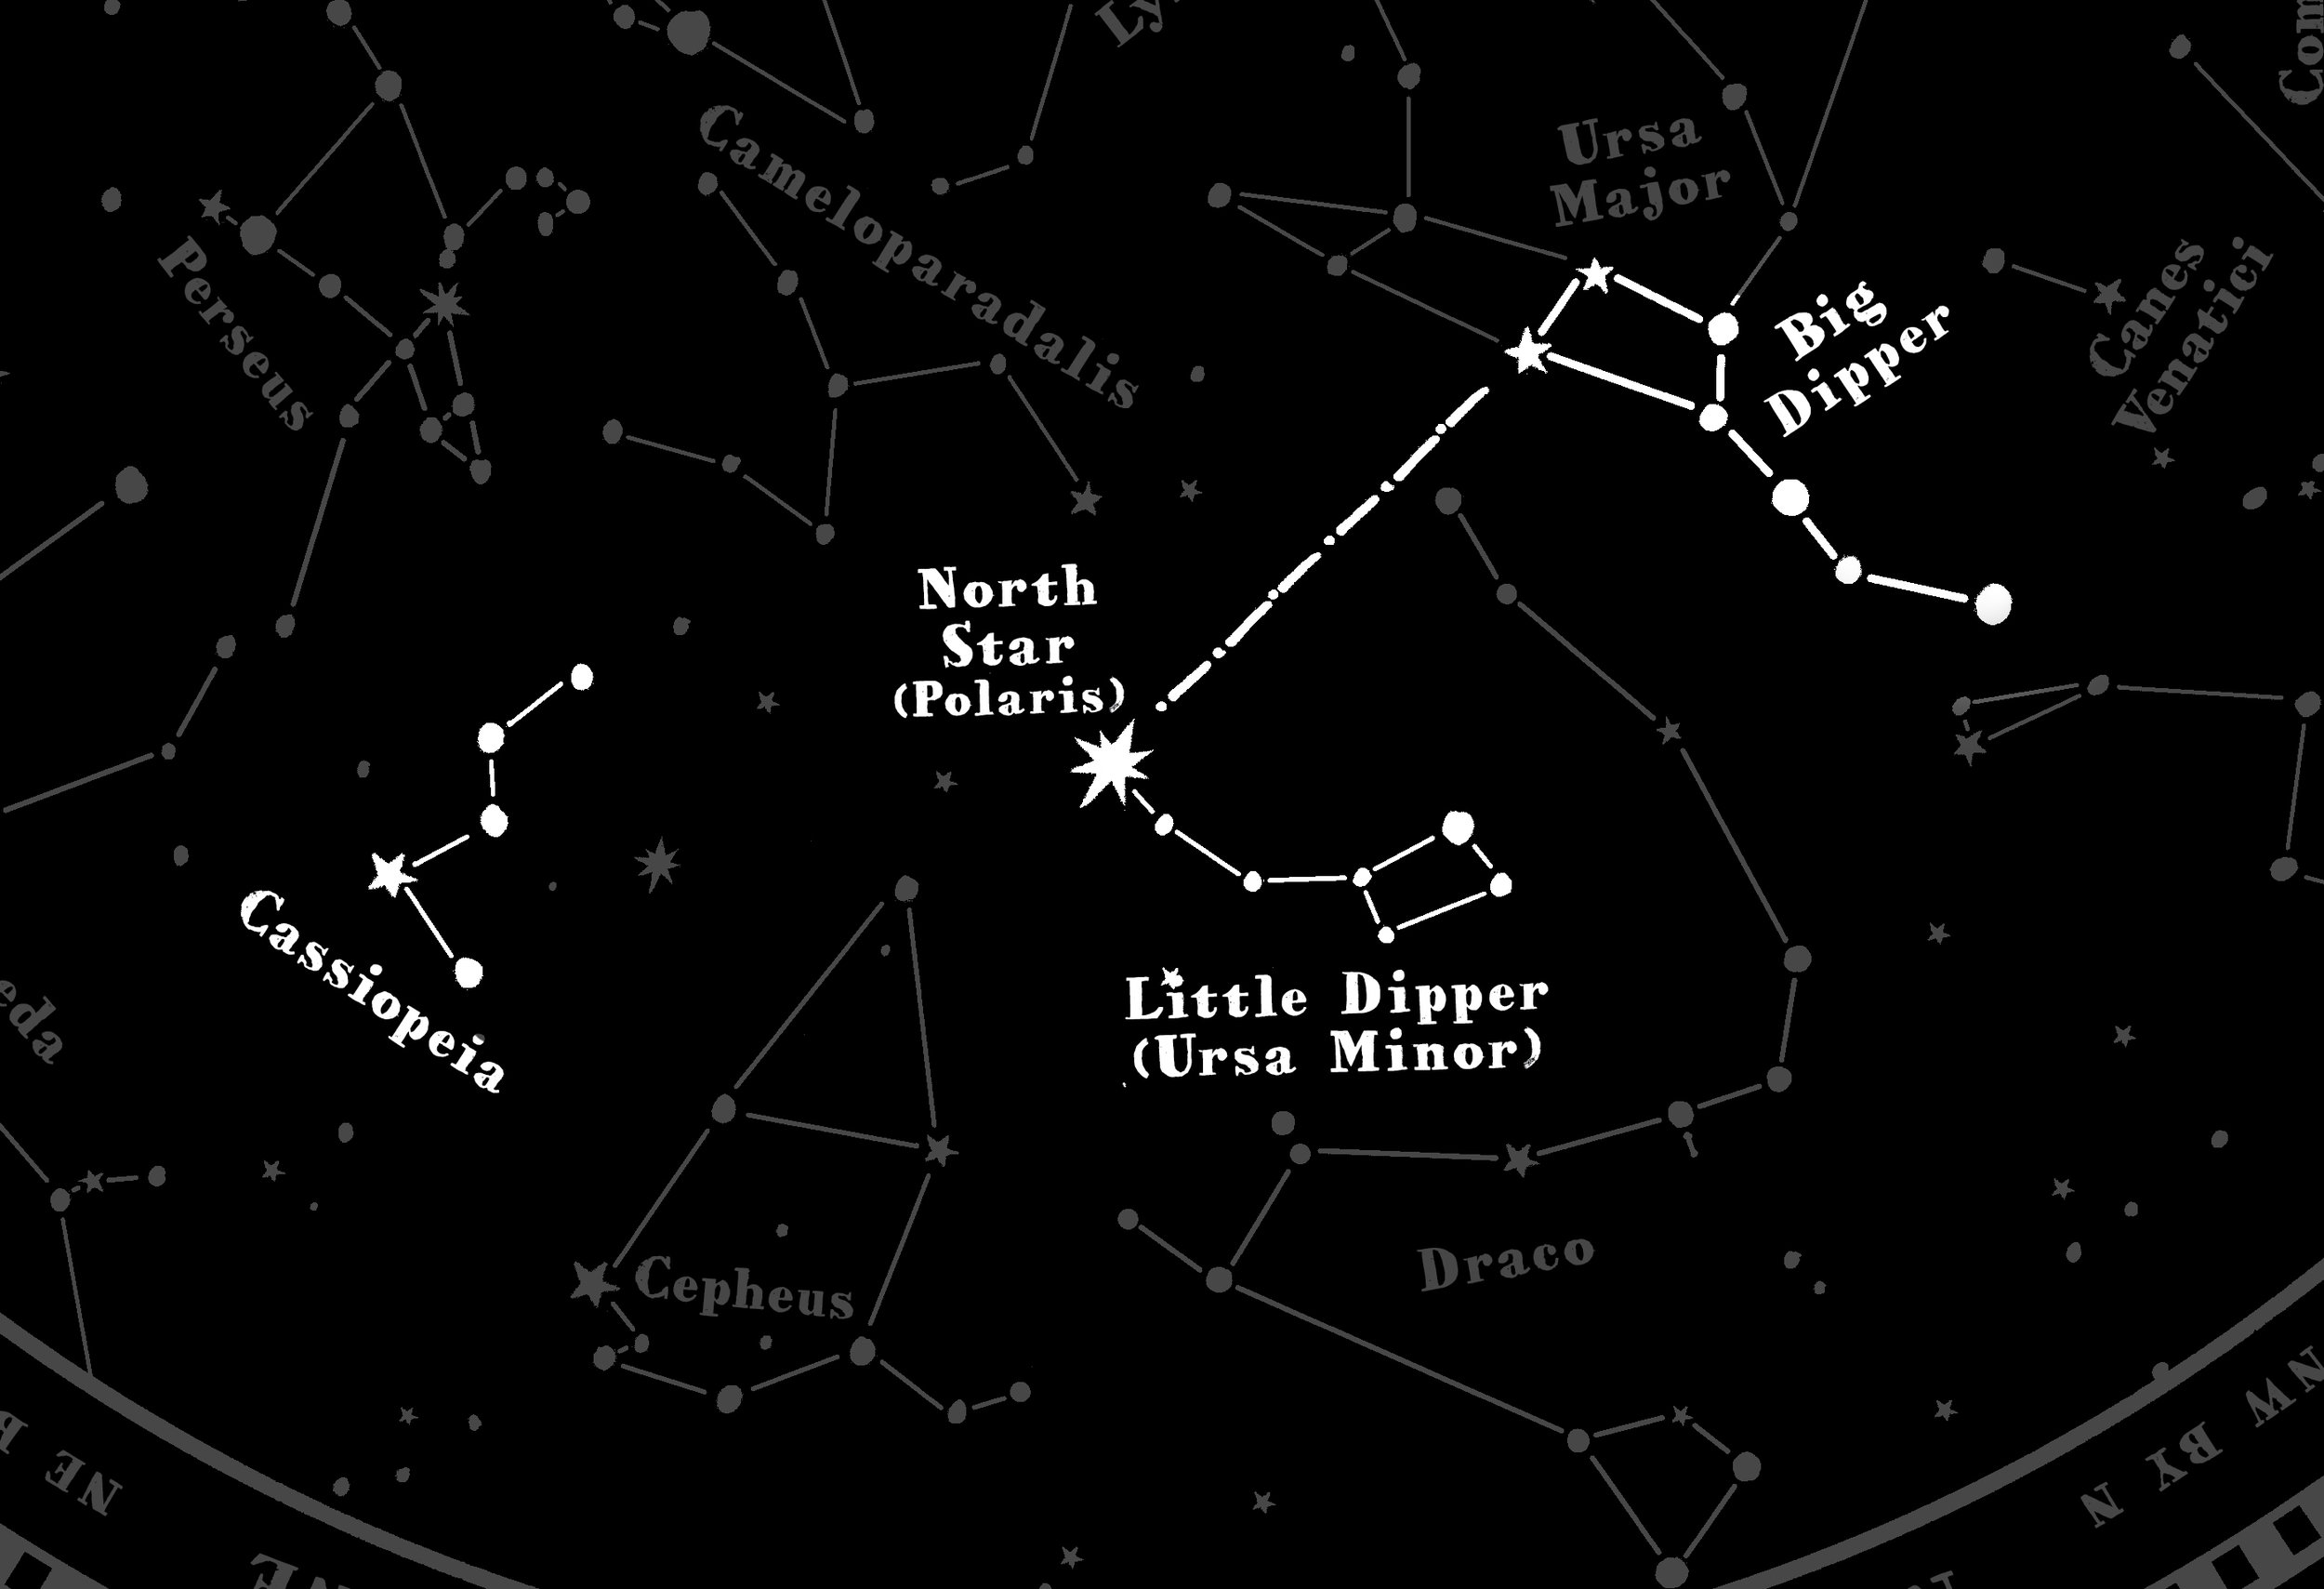 colter_co_navigation_star_bandana